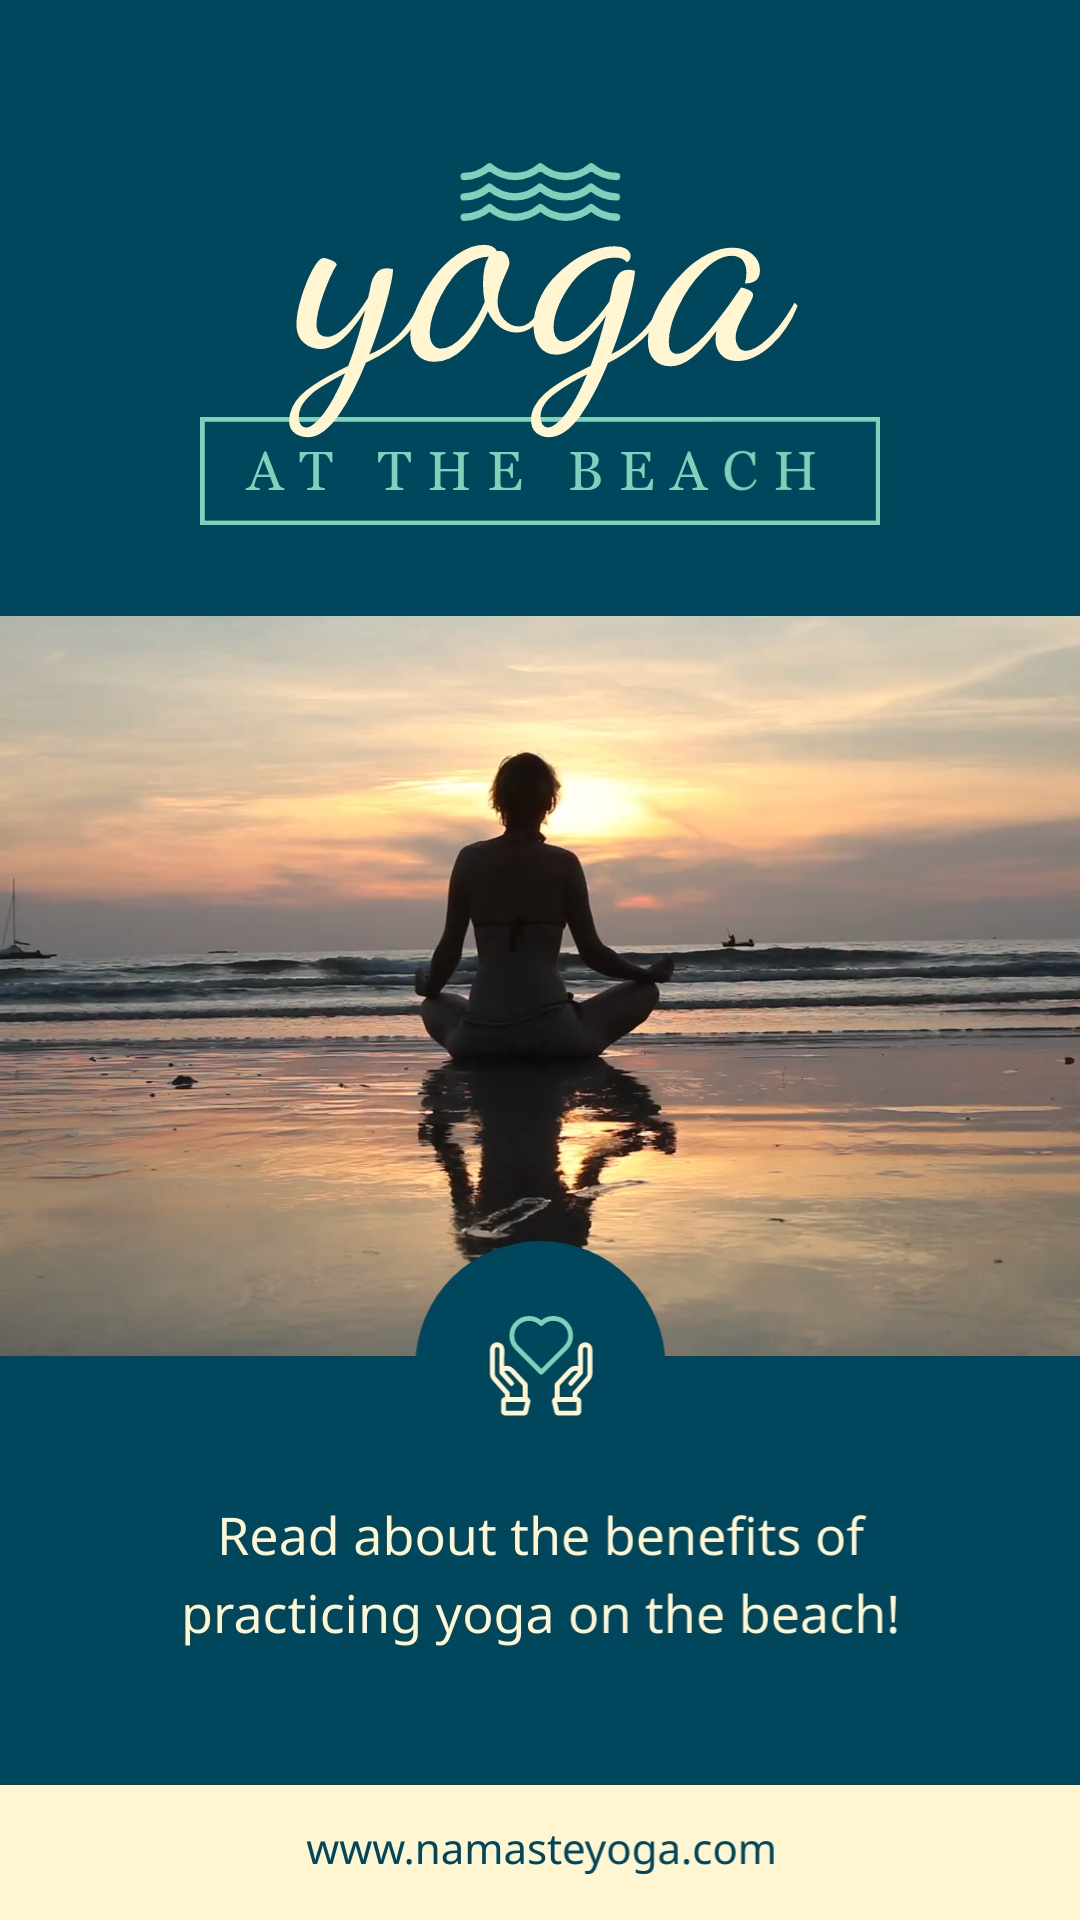 Yoga Beach Pinterest Video Pin Template